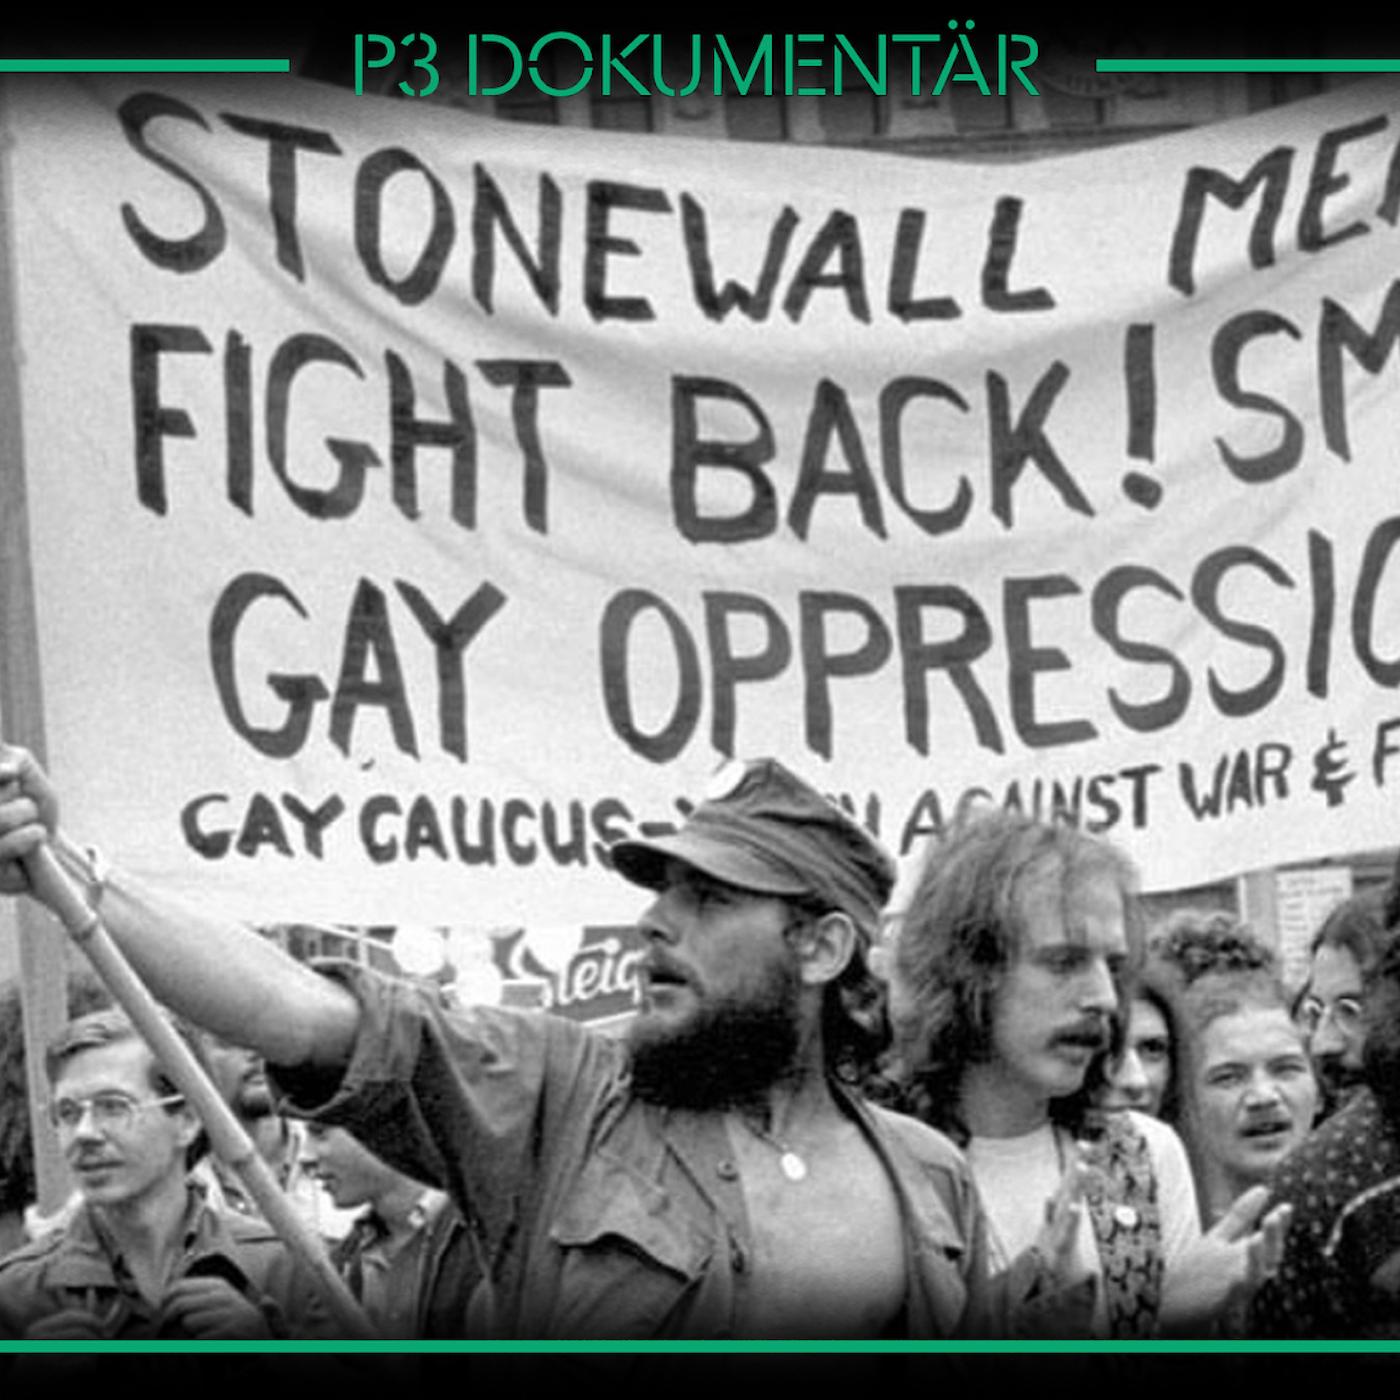 Stonewallupproret